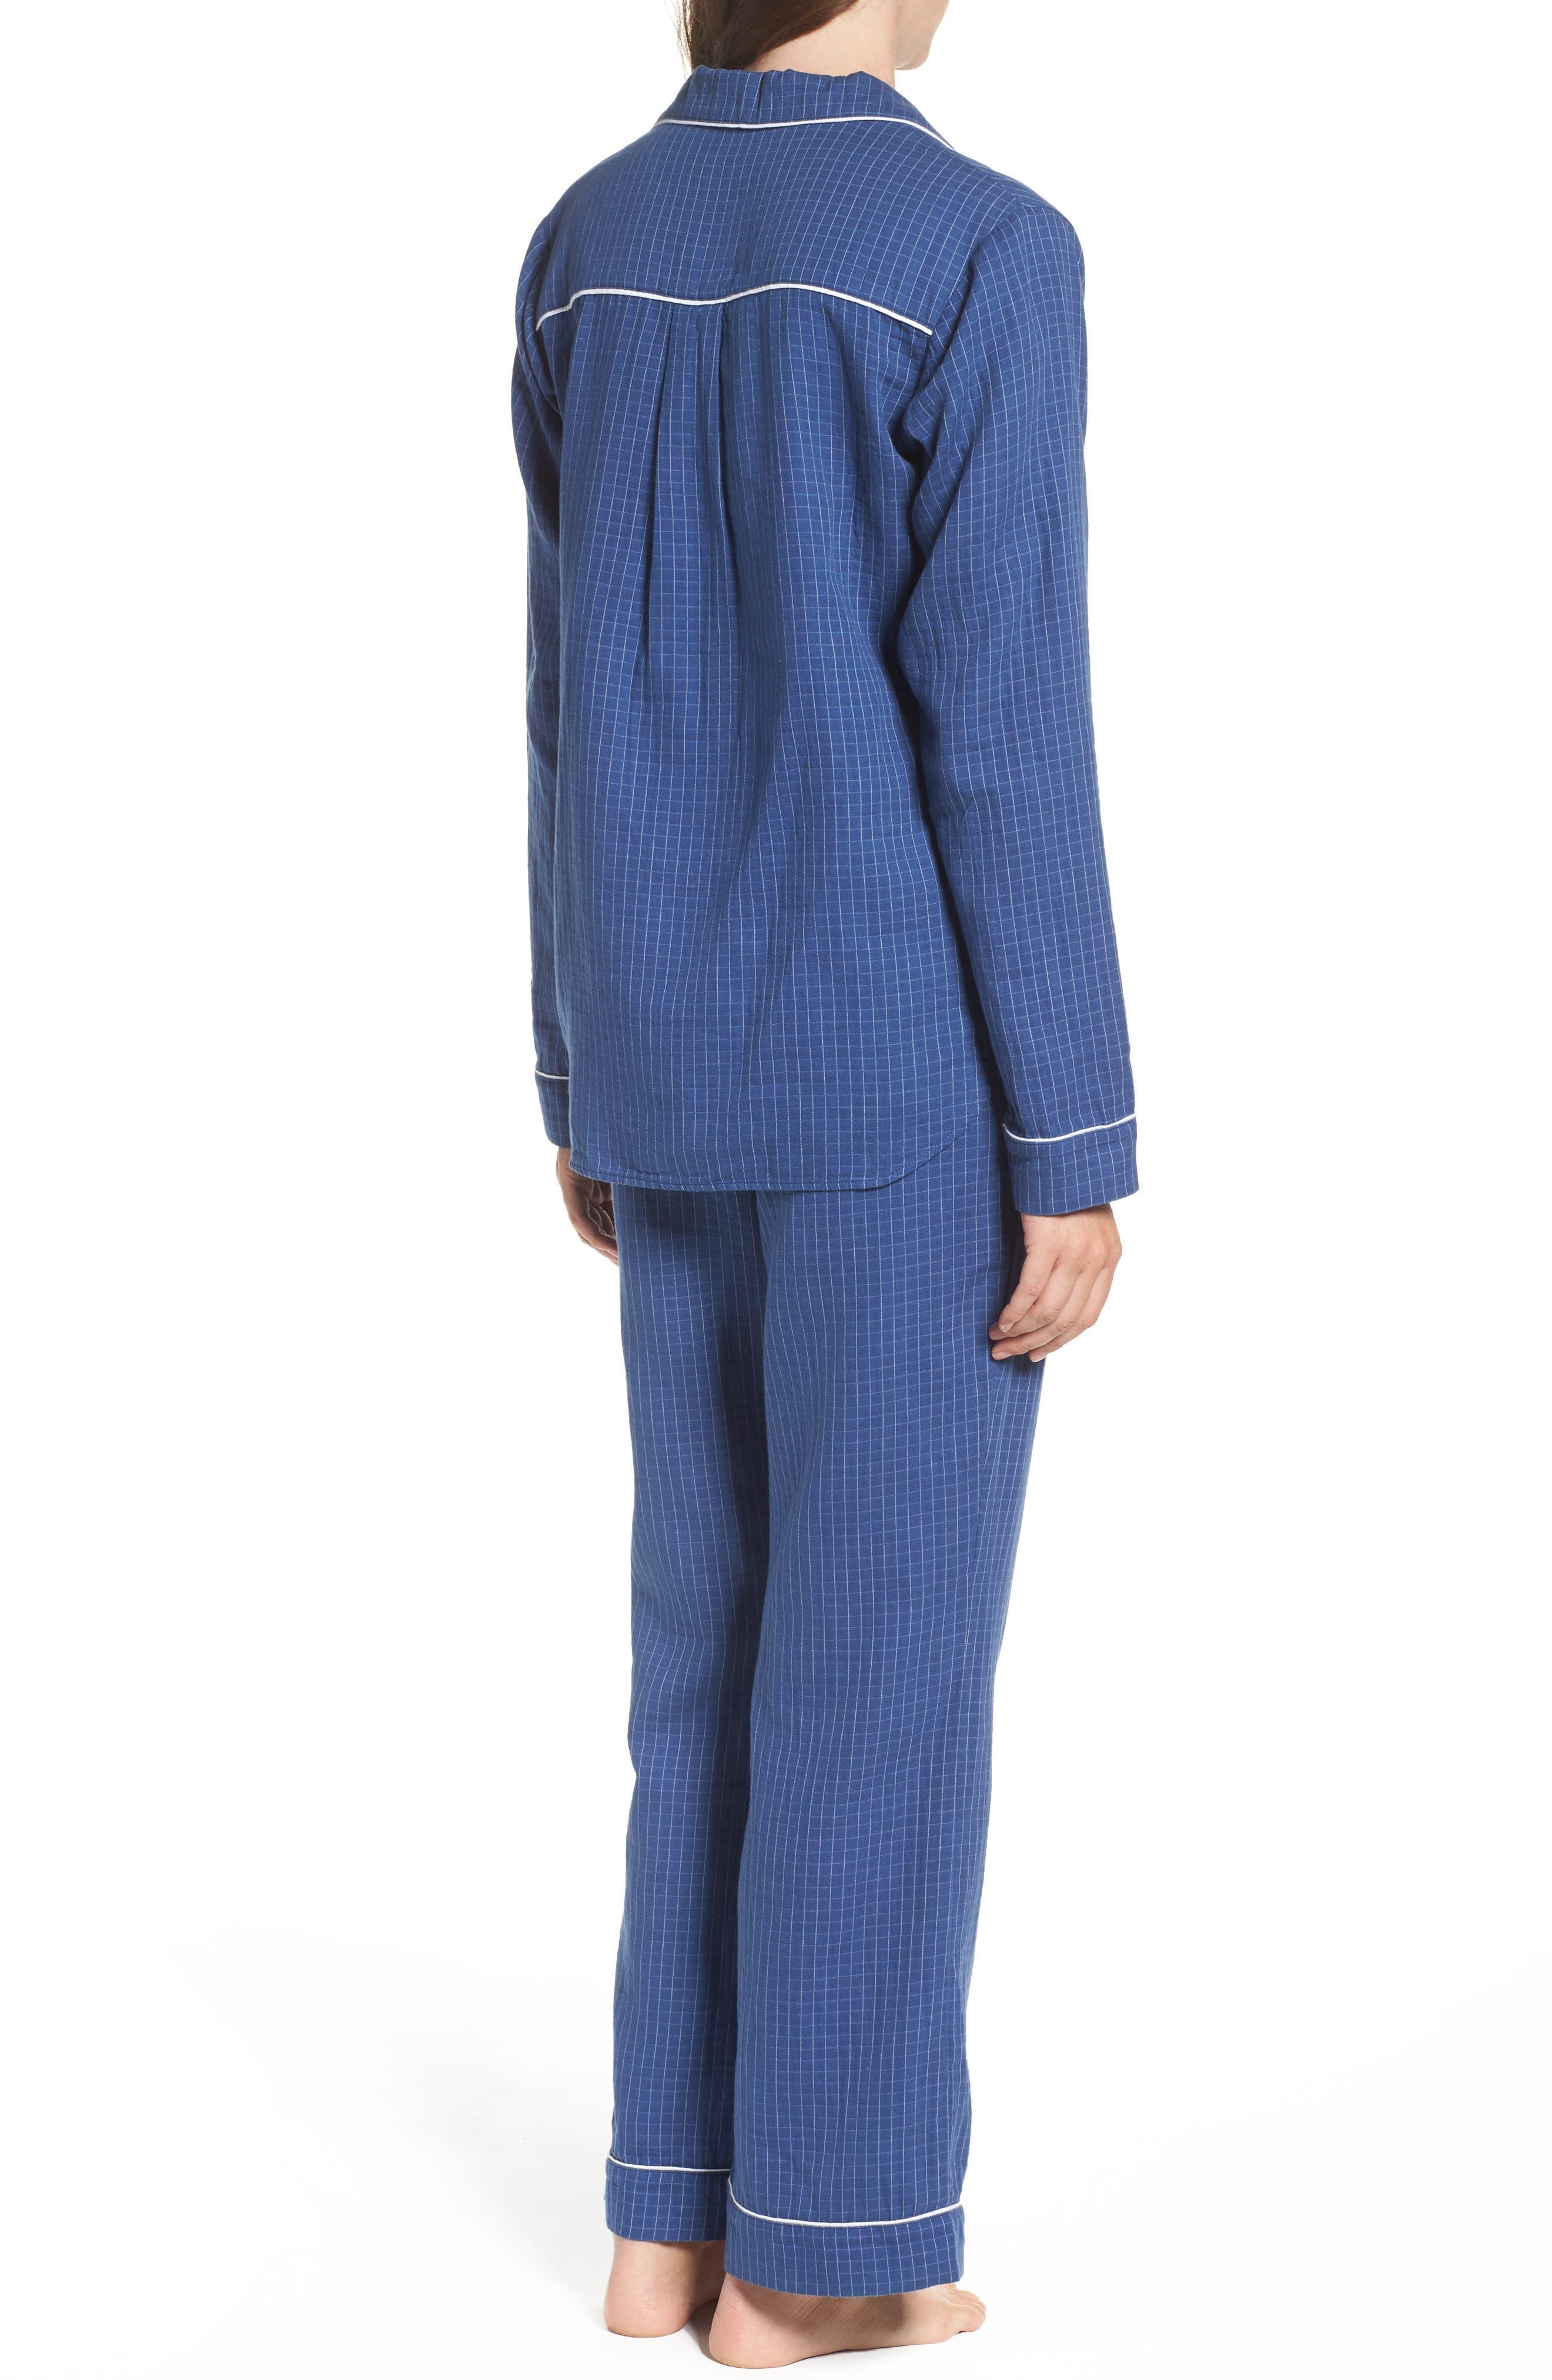 Raven Check Pajamas,                             Alternate thumbnail 2, color,                             400